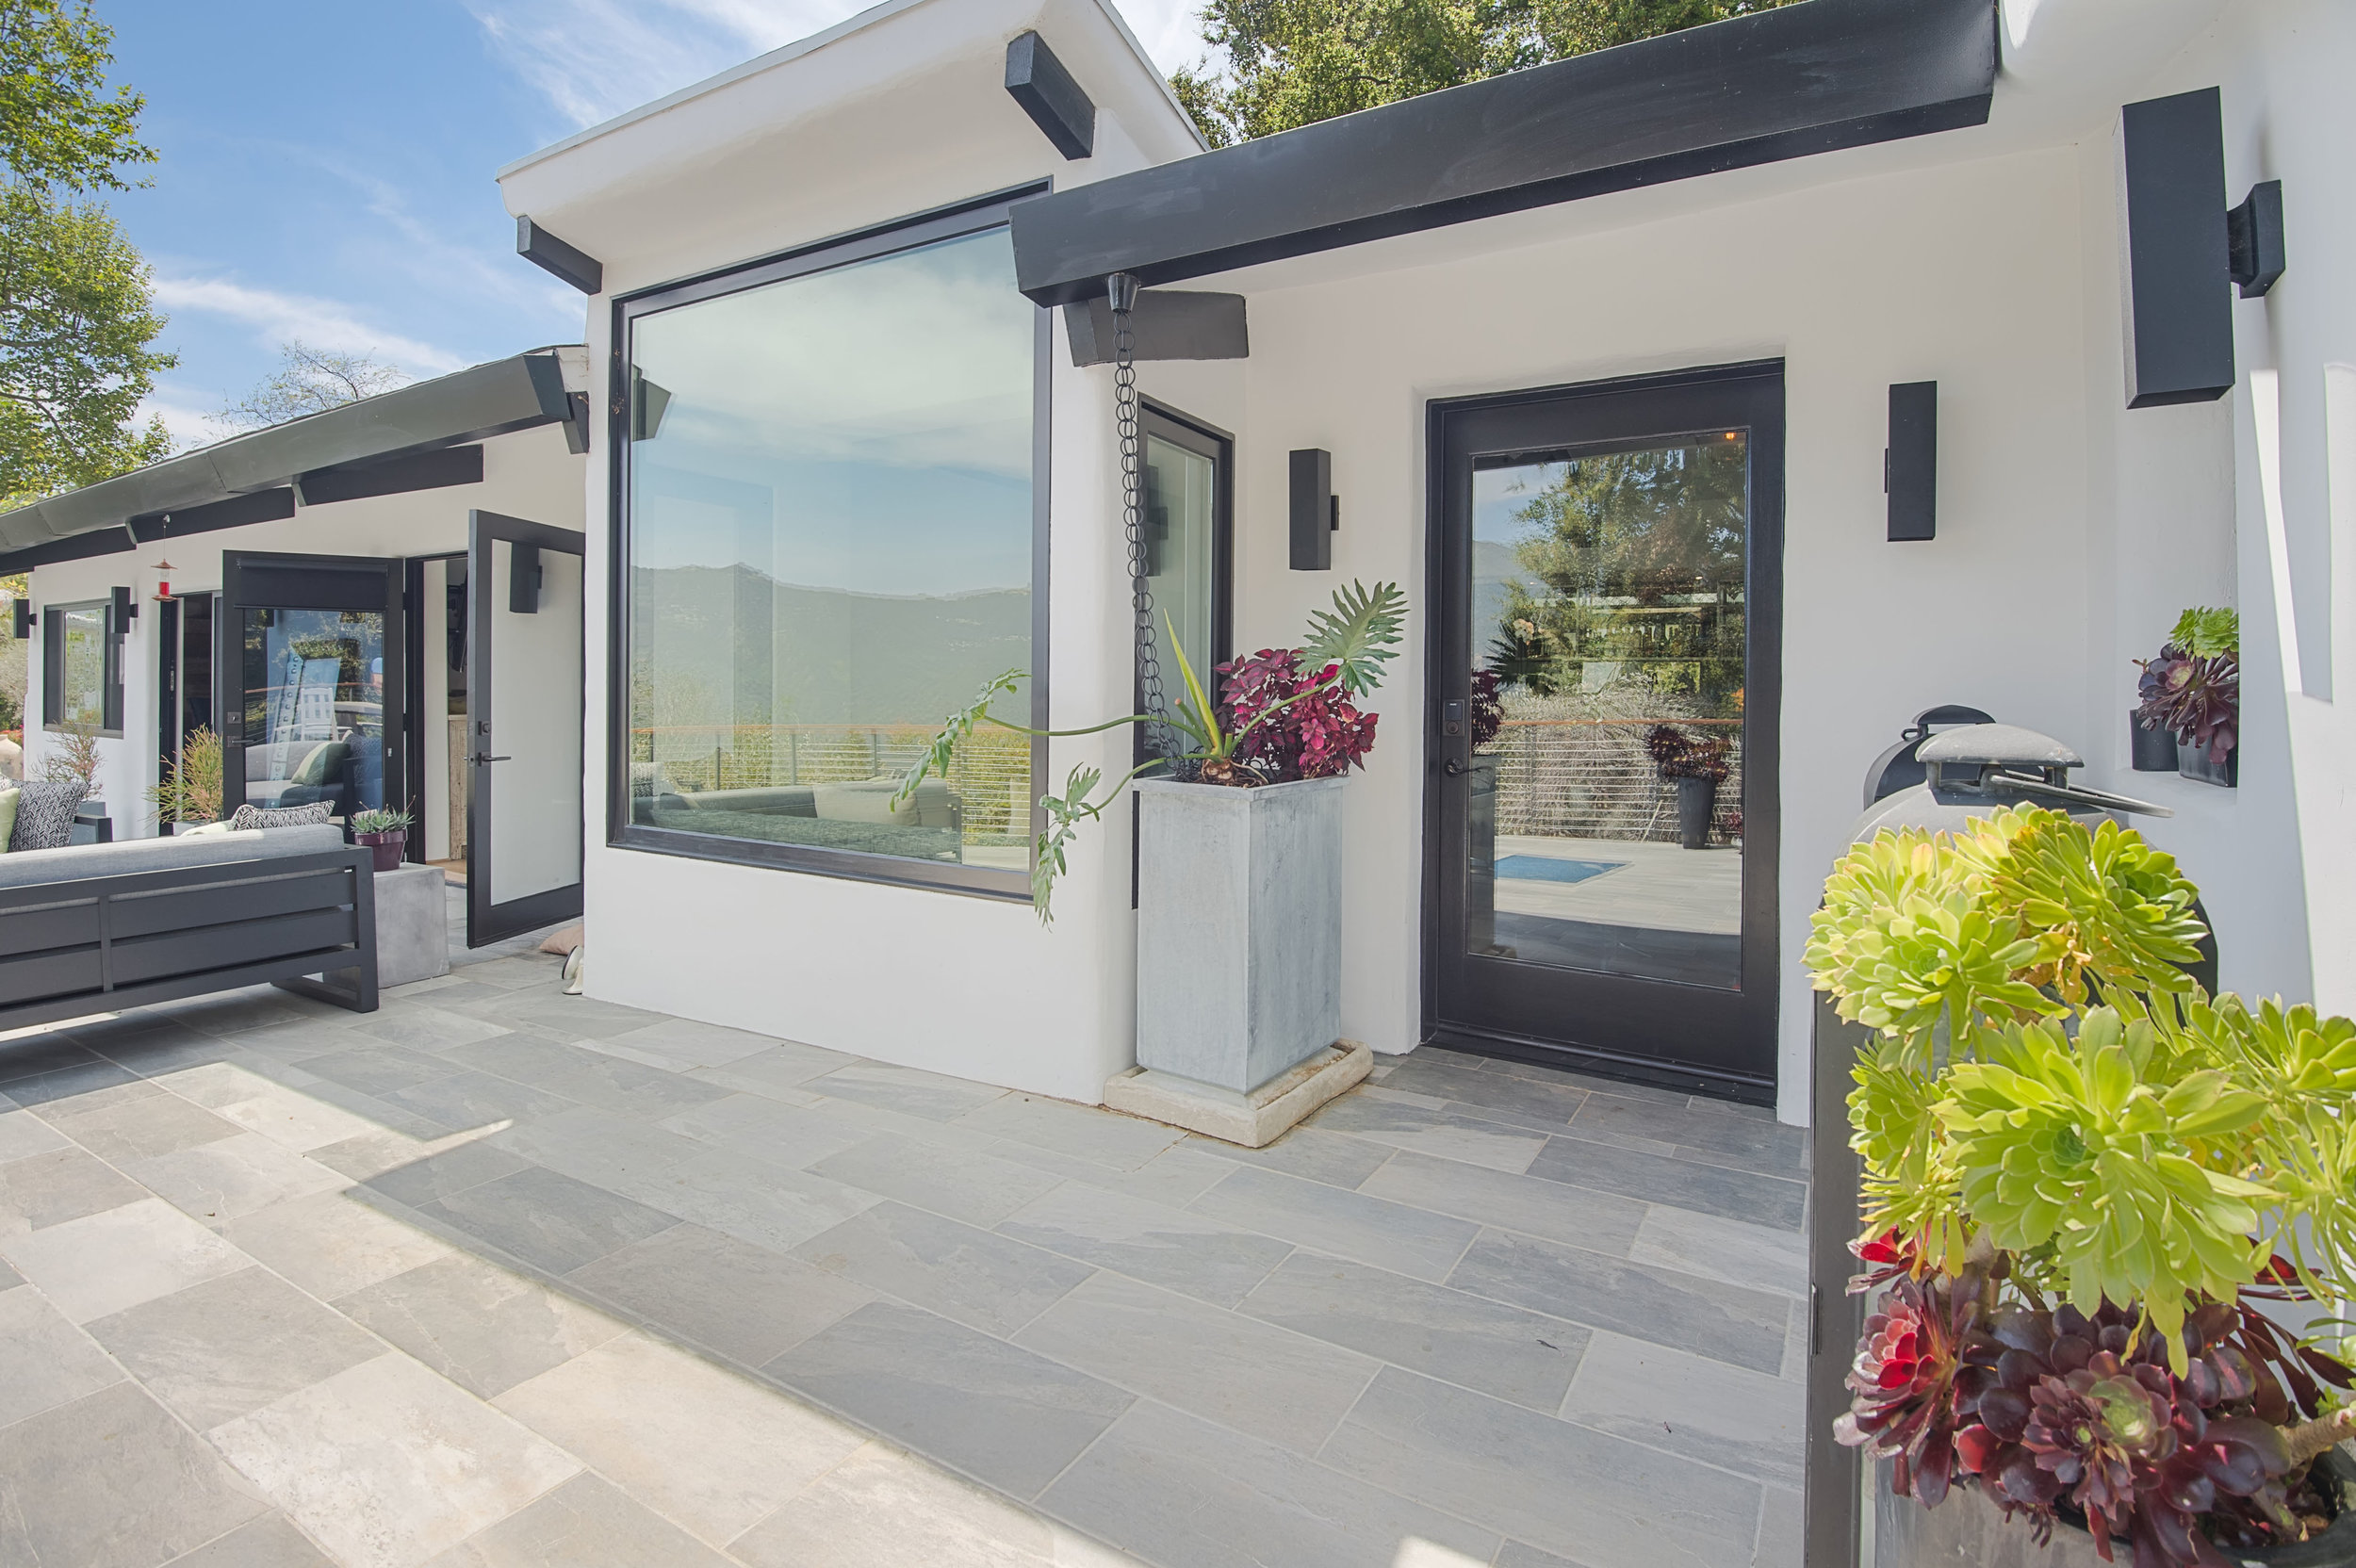 007 Front 26272 Cool Glen Way Malibu For Sale Luxury Real Estate.jpg